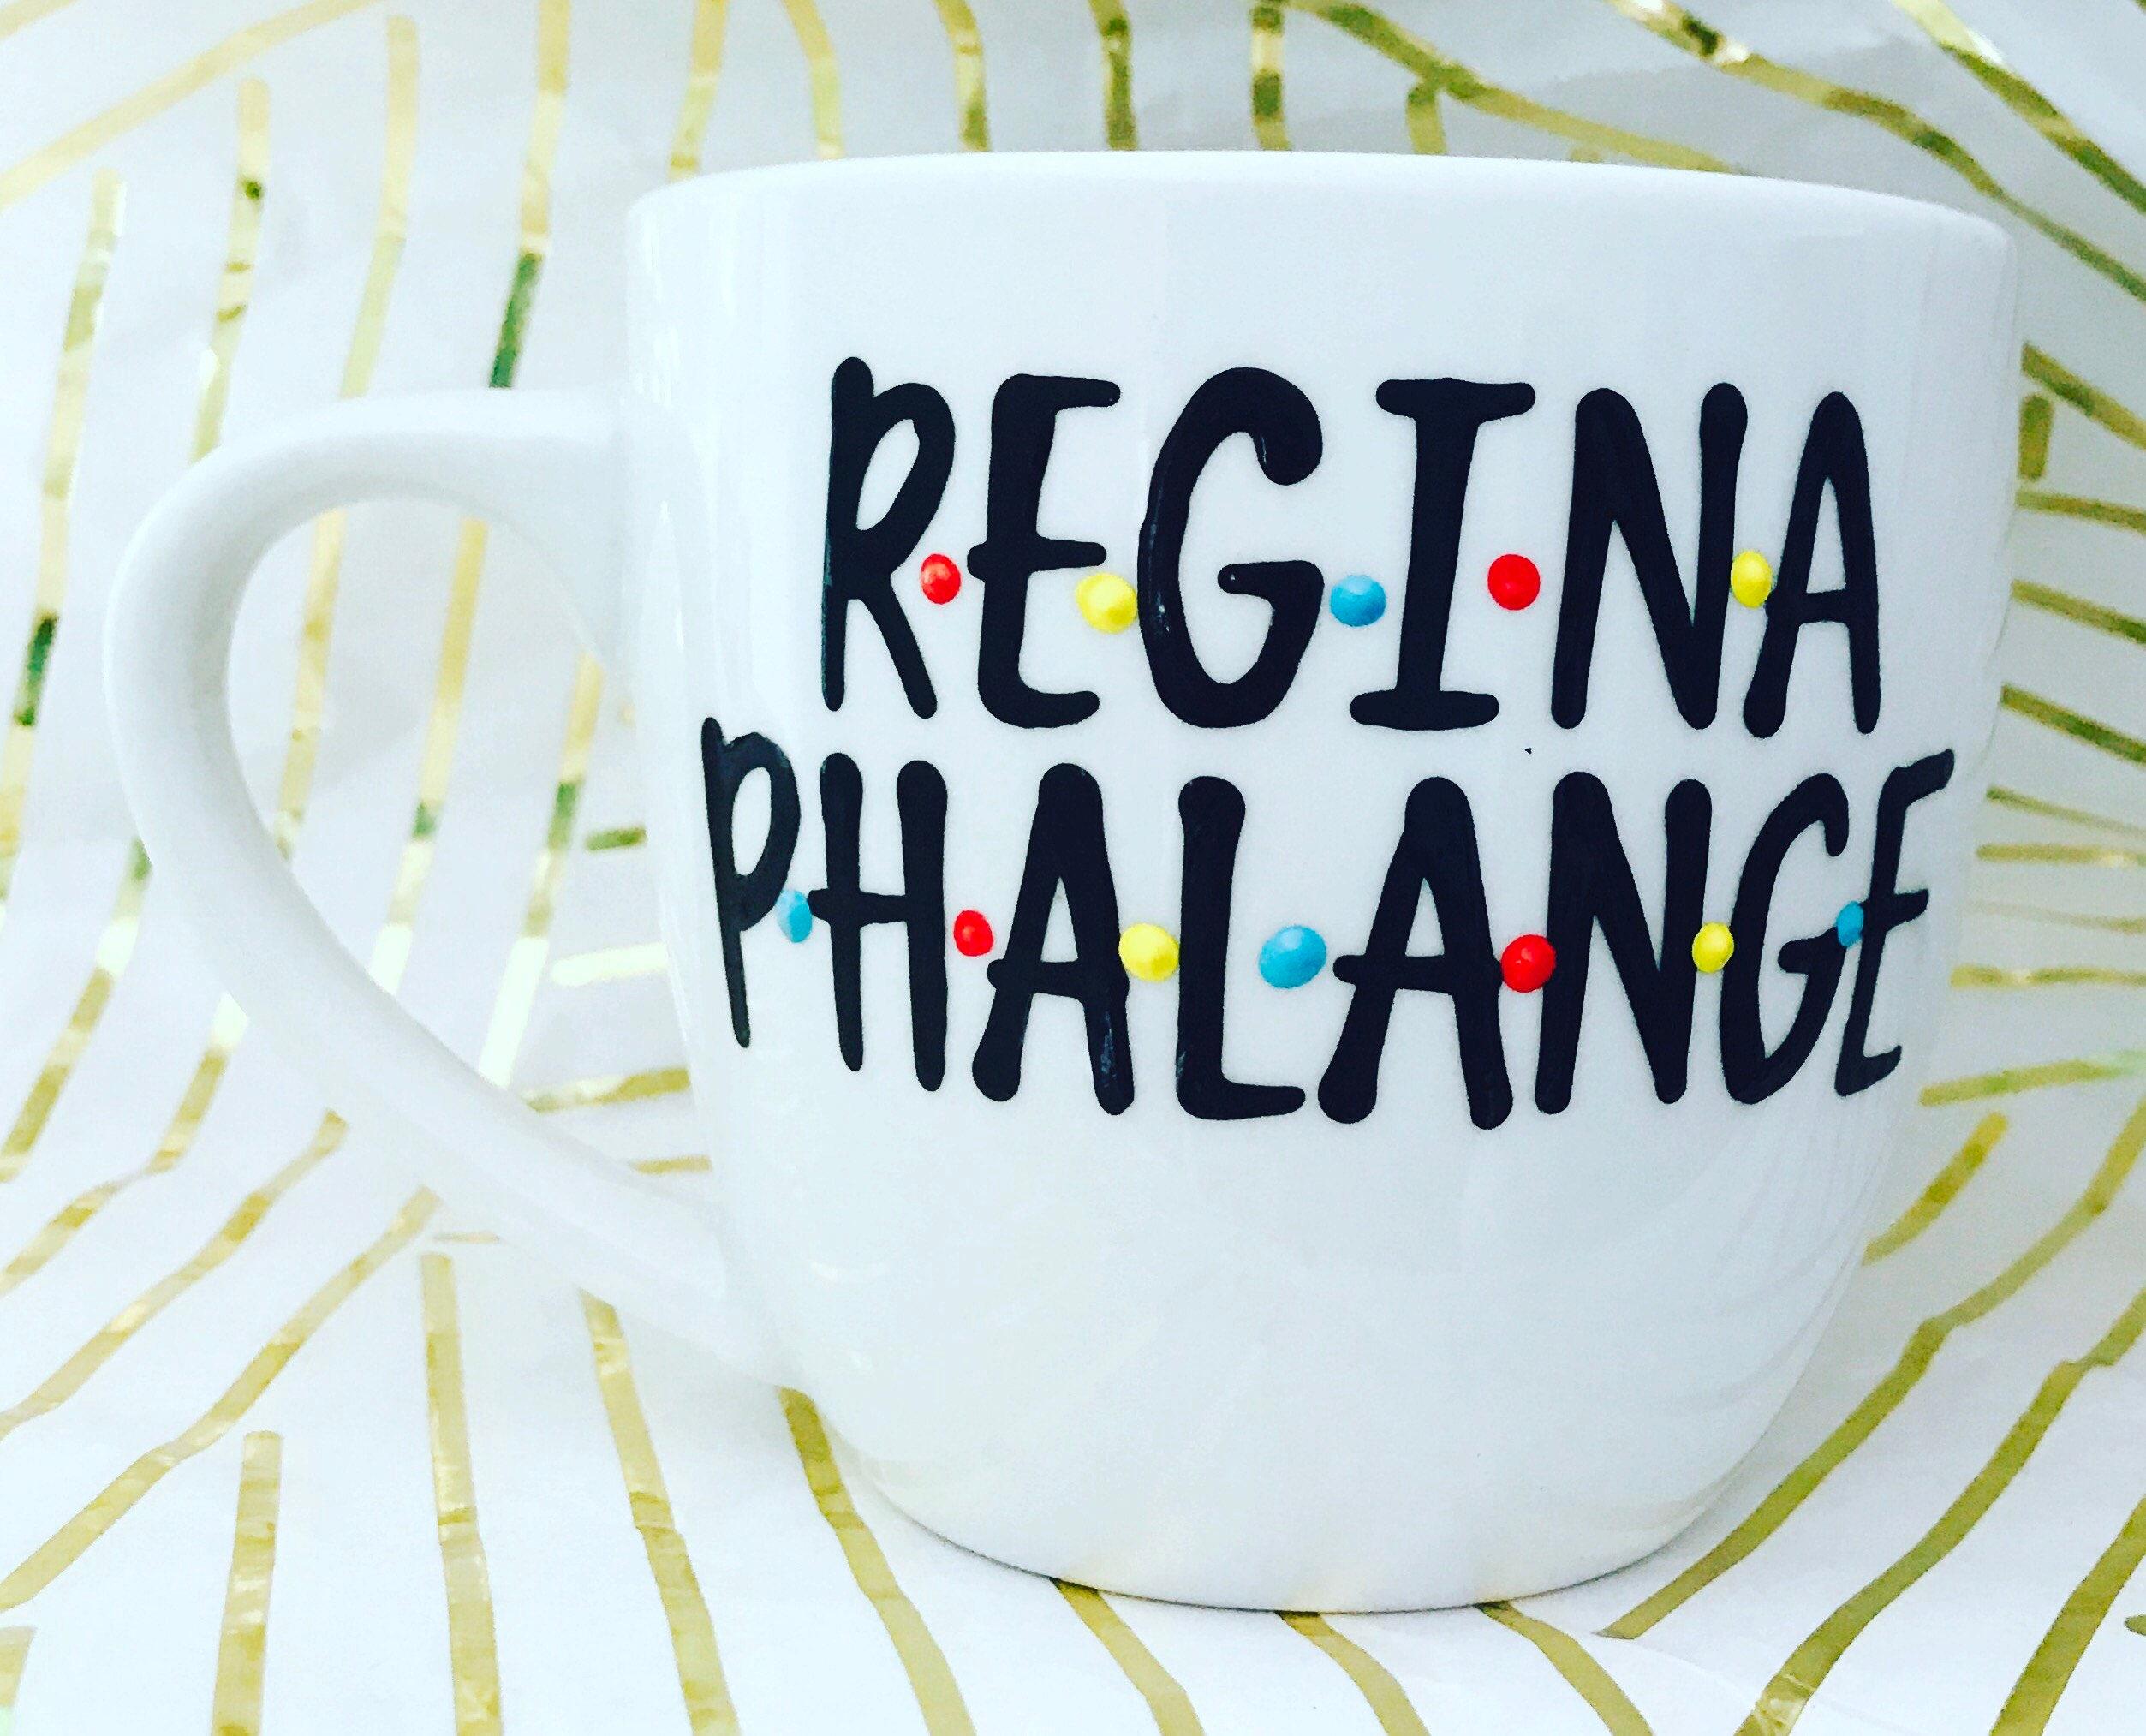 Friends Regina Phalange Crap Bag Princess Consuela